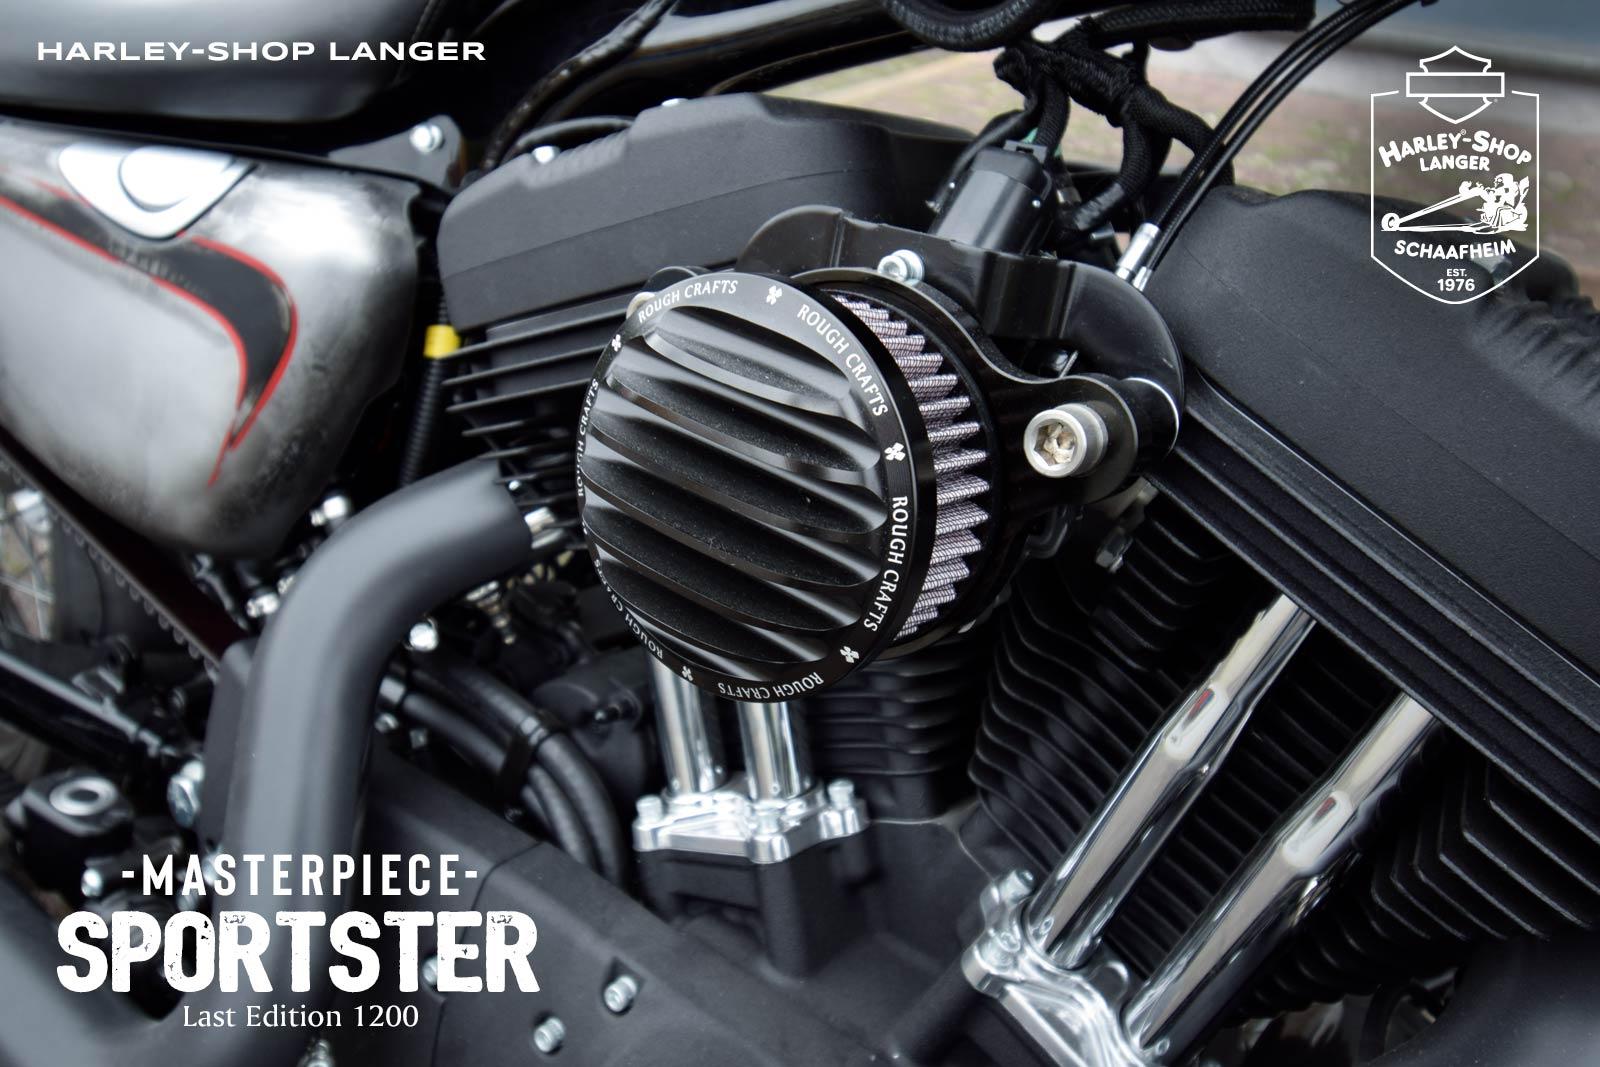 Harley-Shop Langer Sportster Umbau Masterpiece Custombike